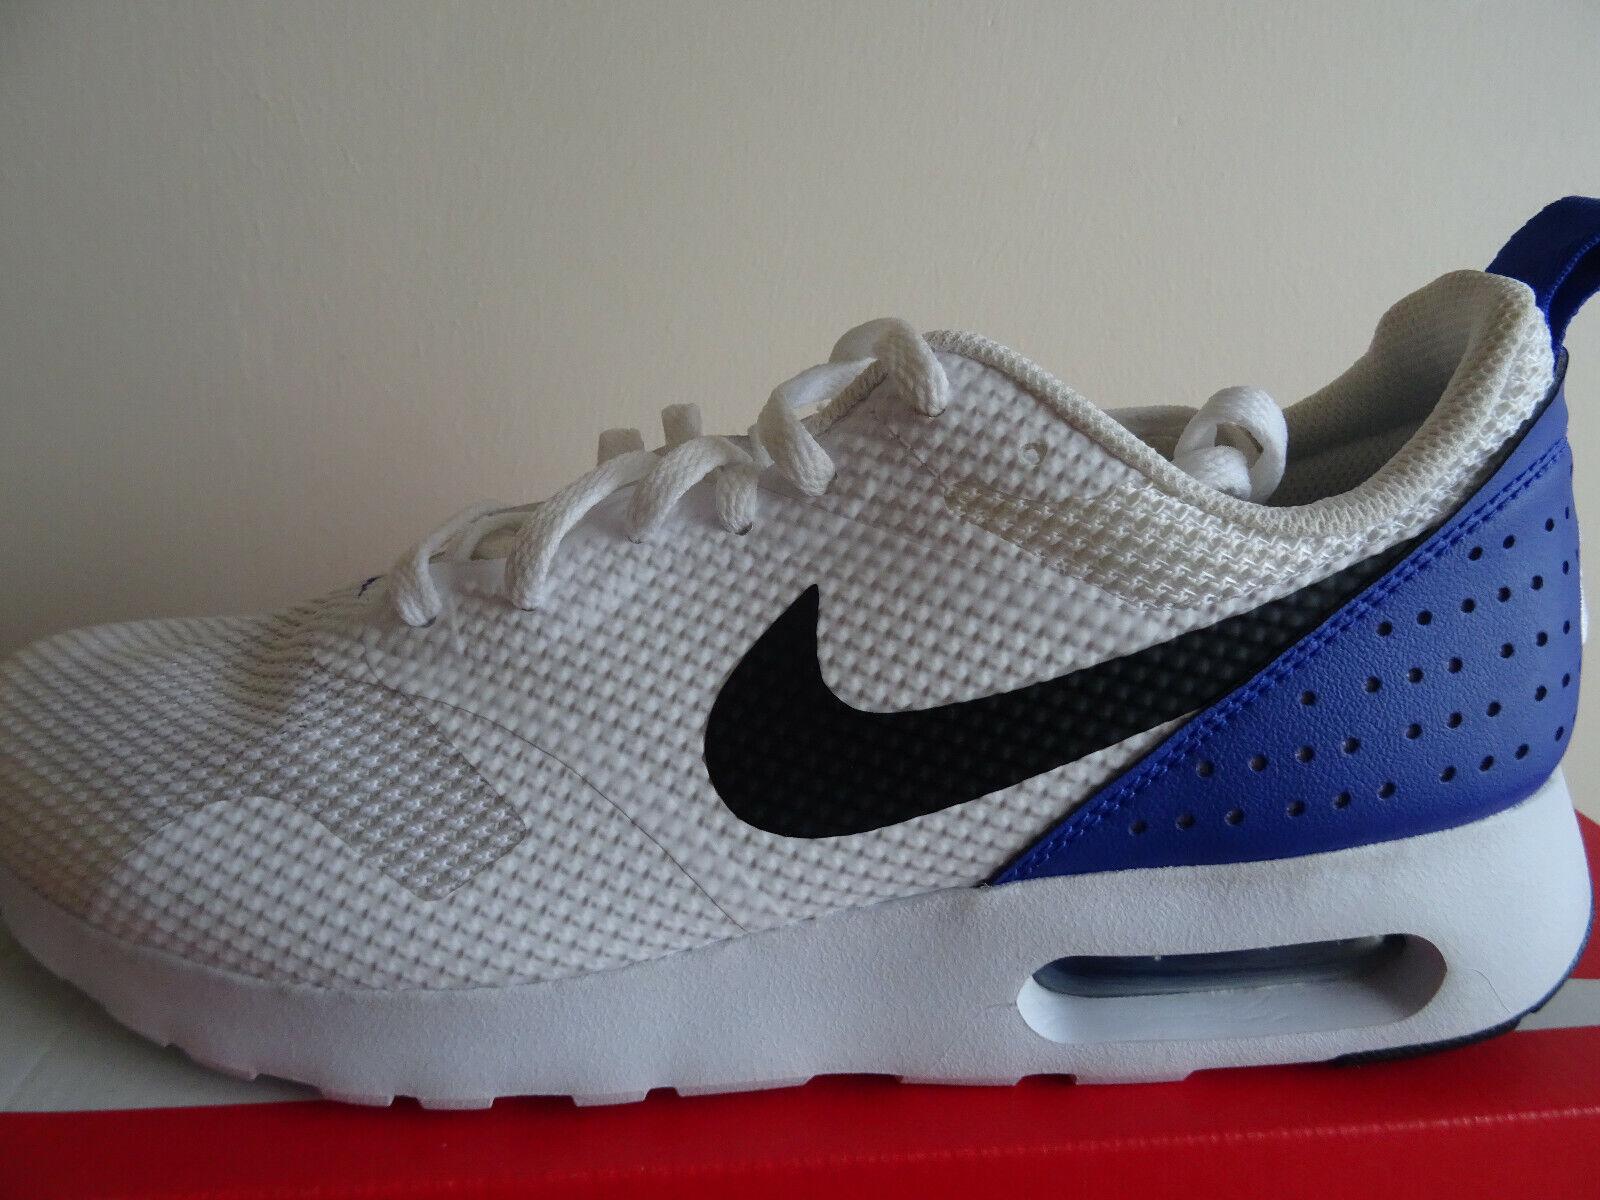 Nike Air Max Tavas Baskets Homme Chaussures 705149 104 UK 6.5 EU 40.5 US 7.5 Neuf + Boîte